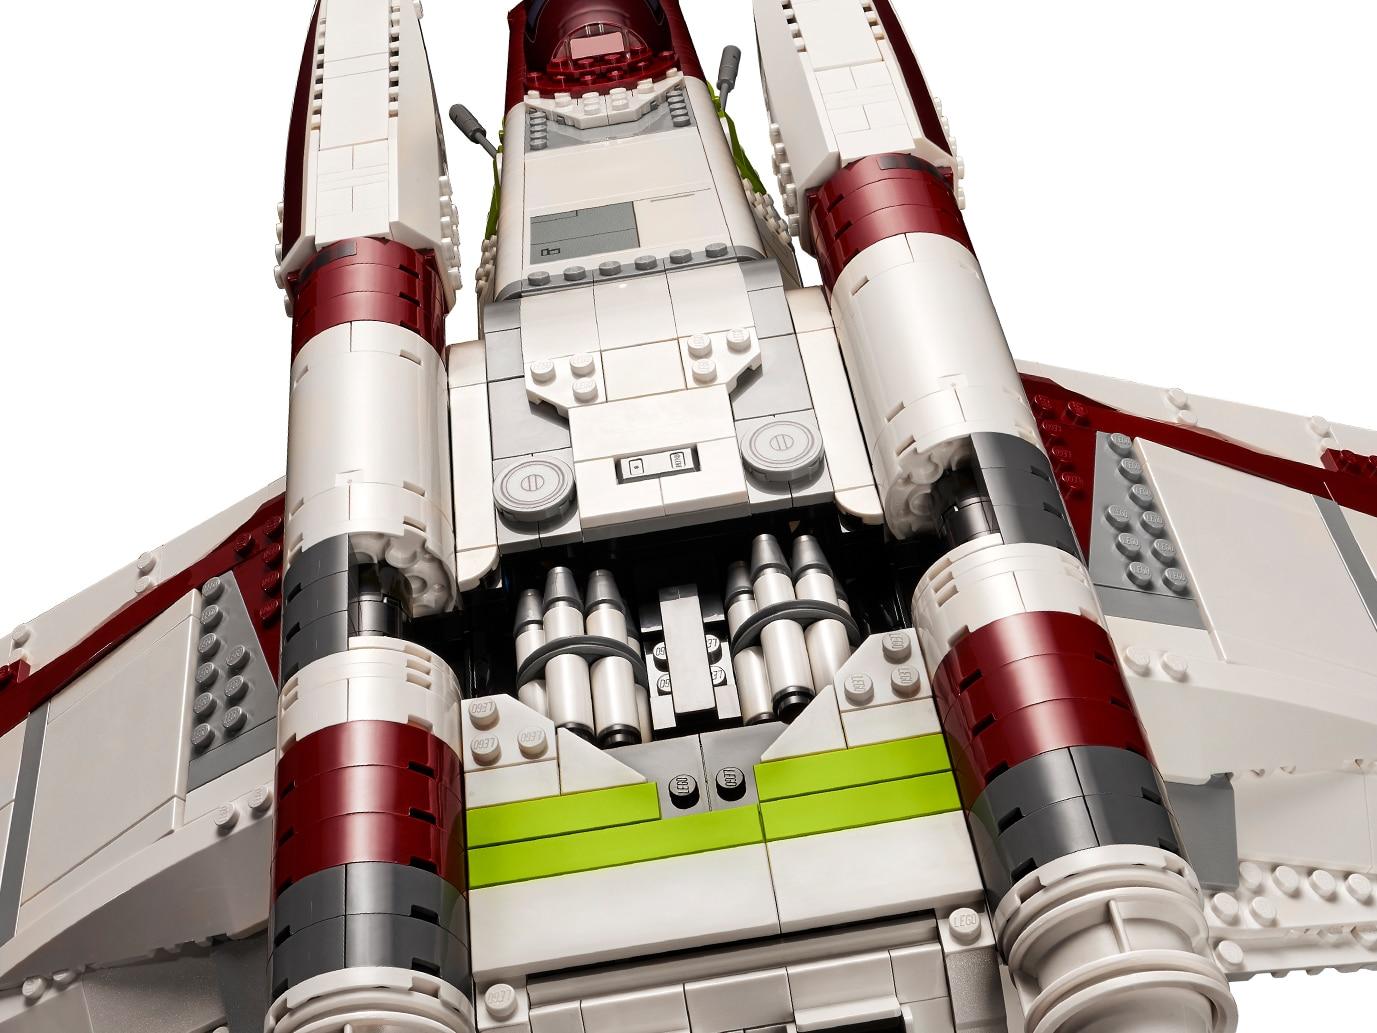 LEGO Ucs Gunship Slider 2